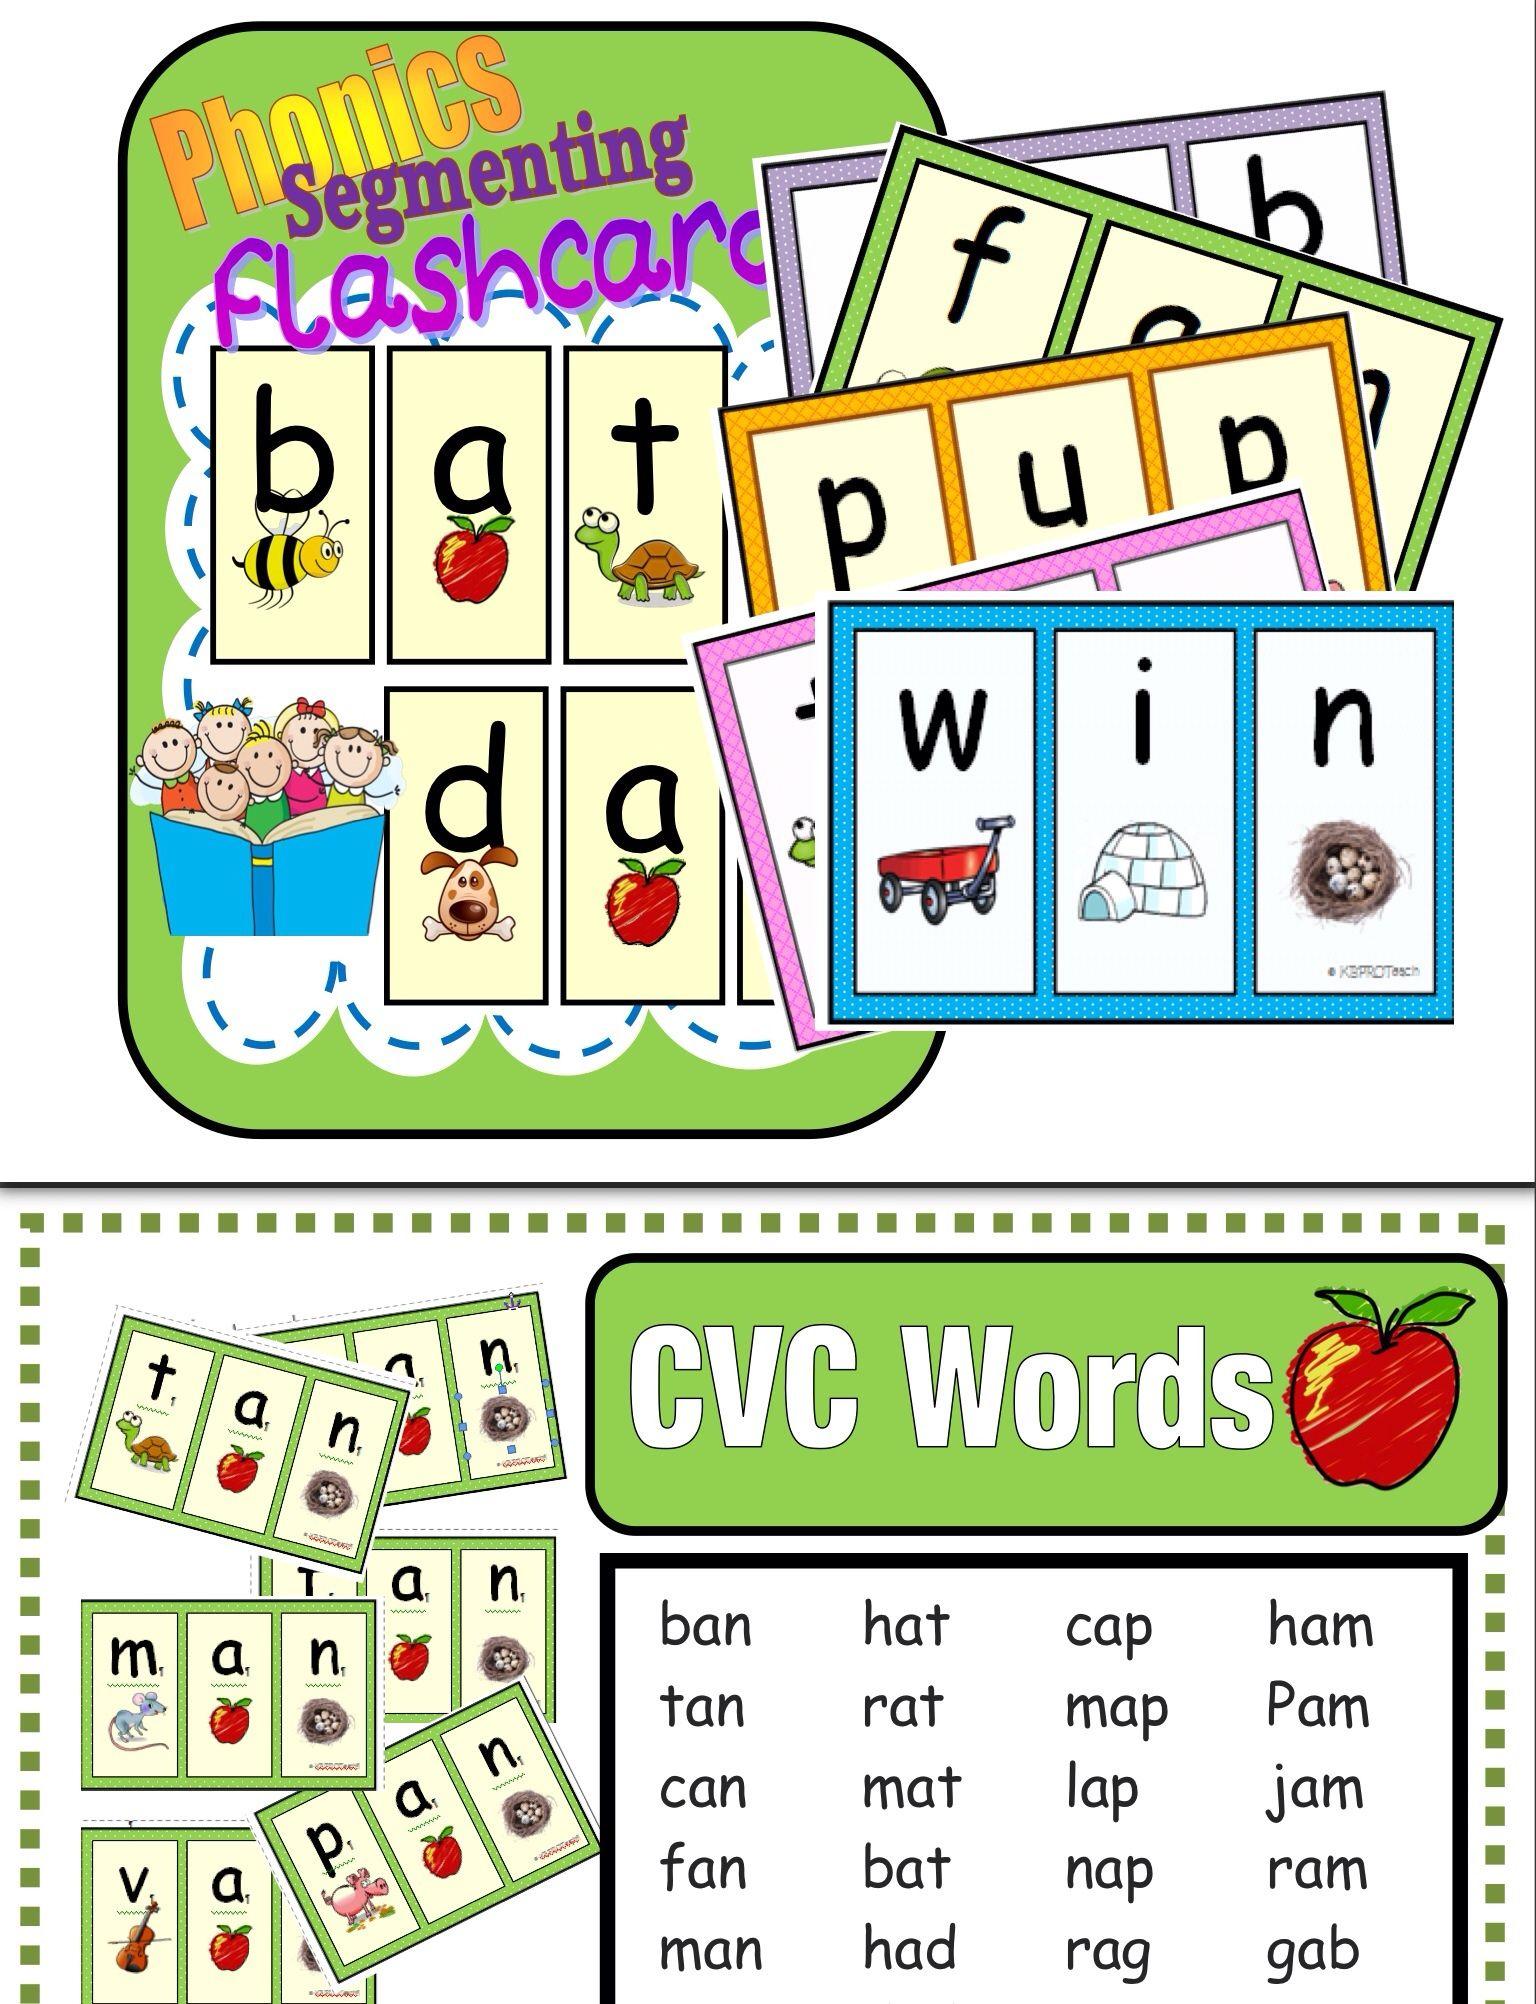 Segmenting & Phonemic Awareness Cards (Decoding CVC Words) Level 1 ...